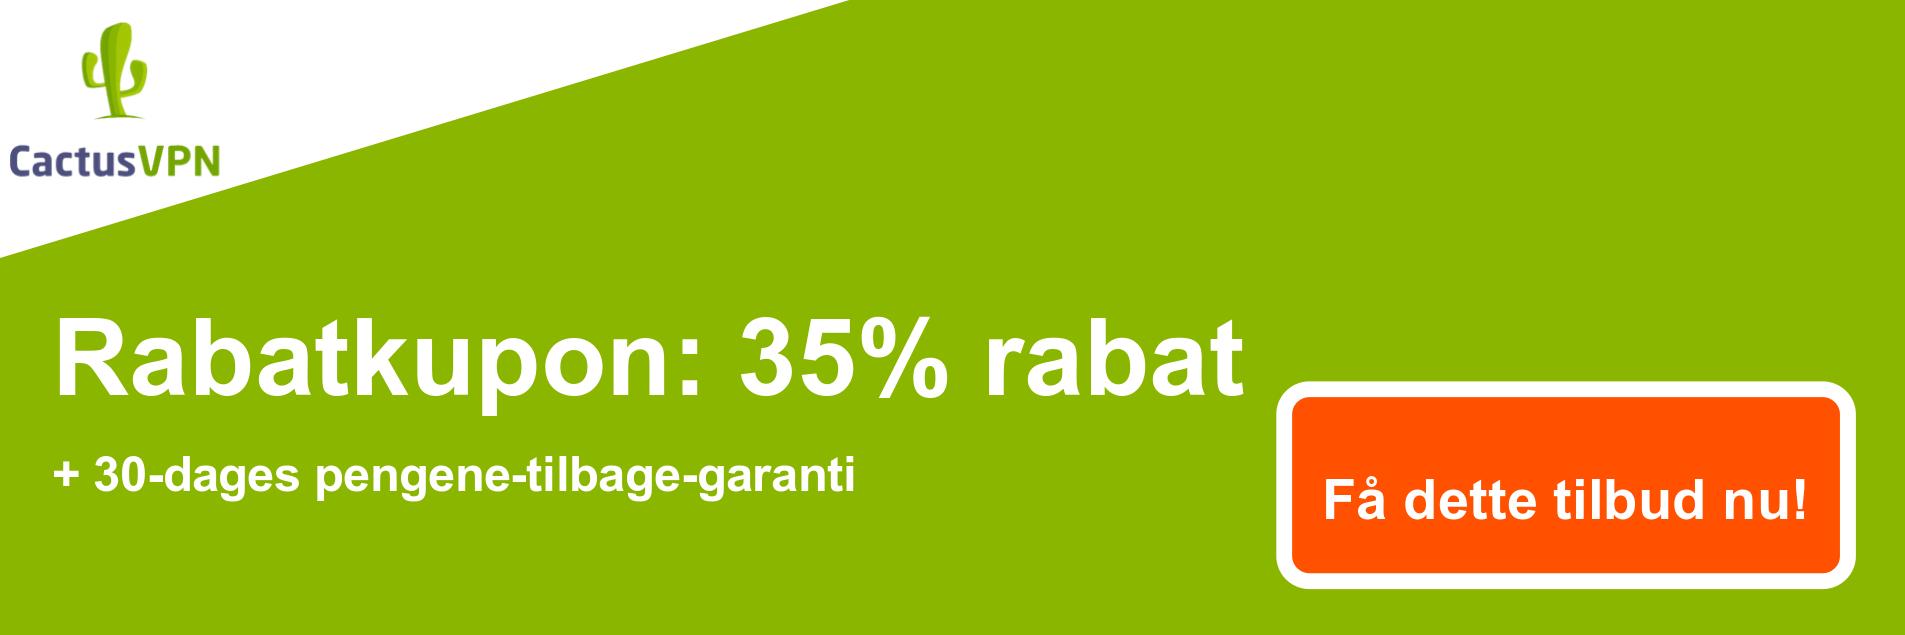 CactusVPN-kuponbanner - 38% rabat